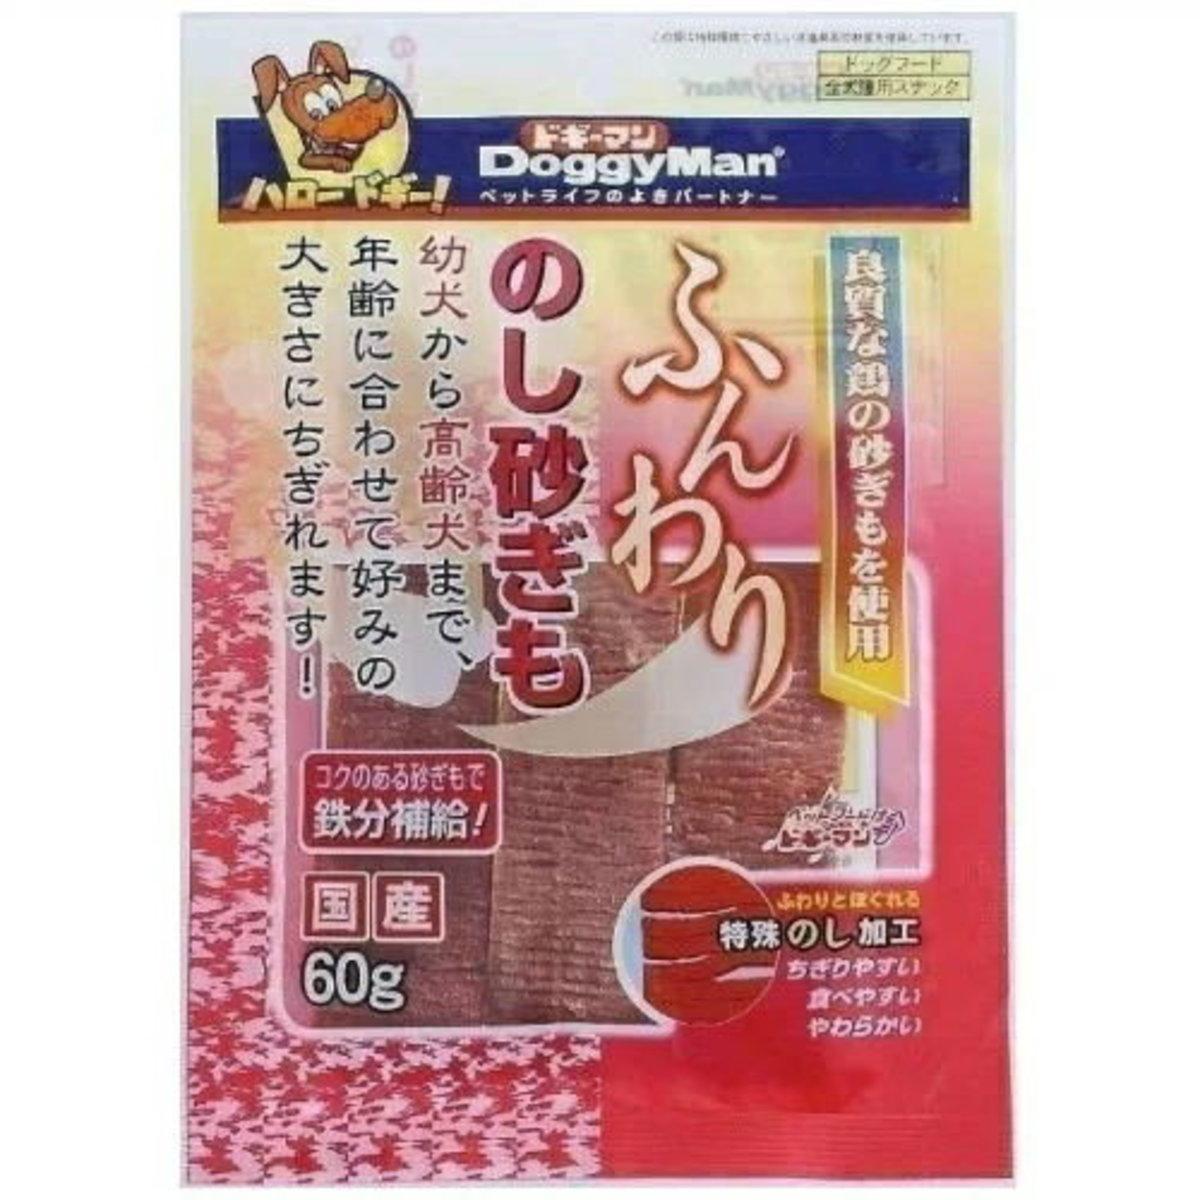 Dog Snack Chicken 60g [exp:2020-12]